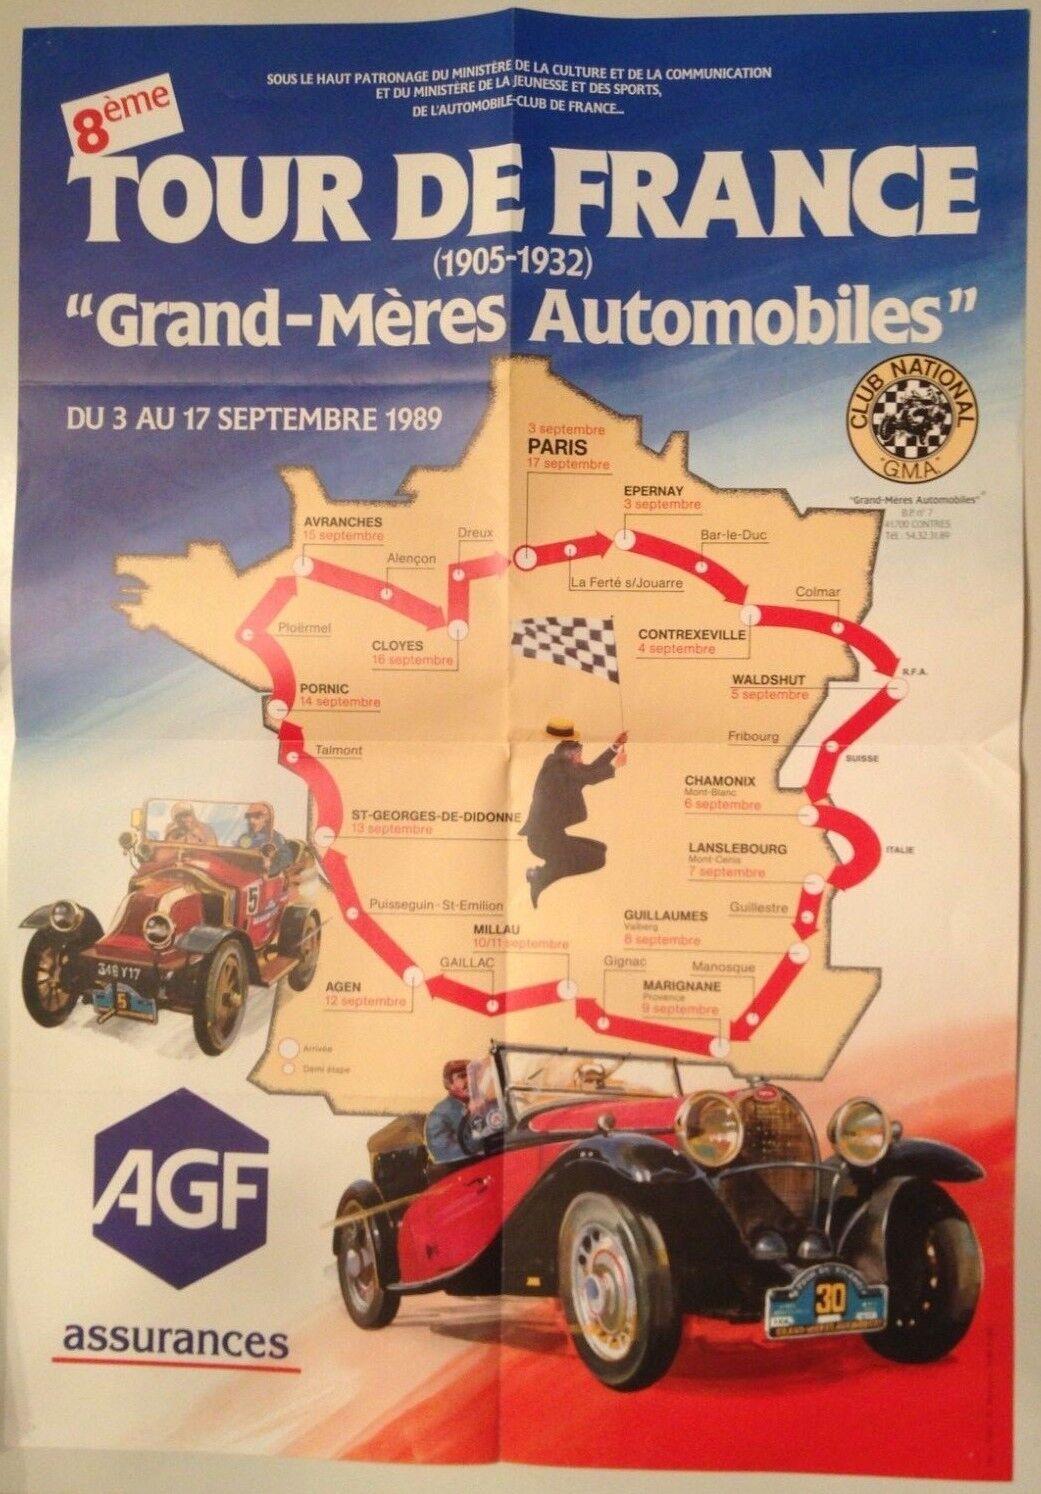 RARE AFFICHE 8e TOUR DE FRANCE GRAND MERES AUTOMOBILES AUTOMOBILES AUTOMOBILES SEPTEMBRE 1989 48c680